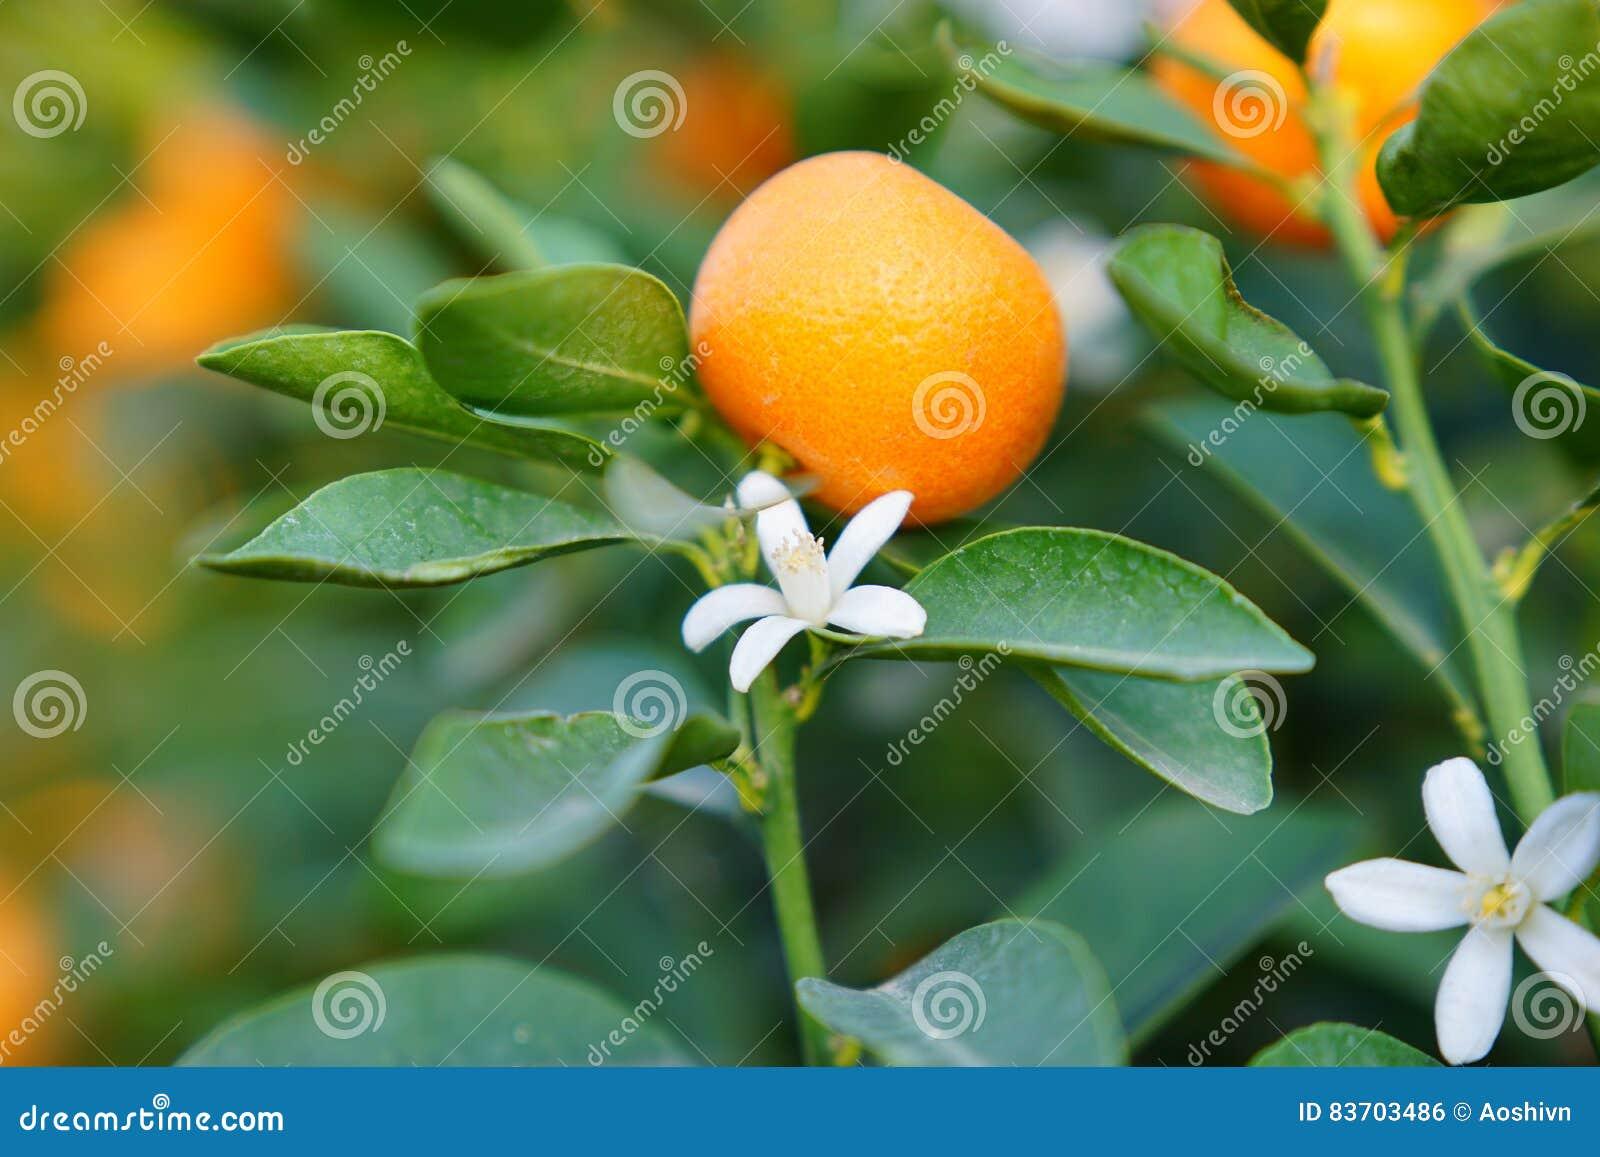 Flowers Of An Orange Tree Stock Photo